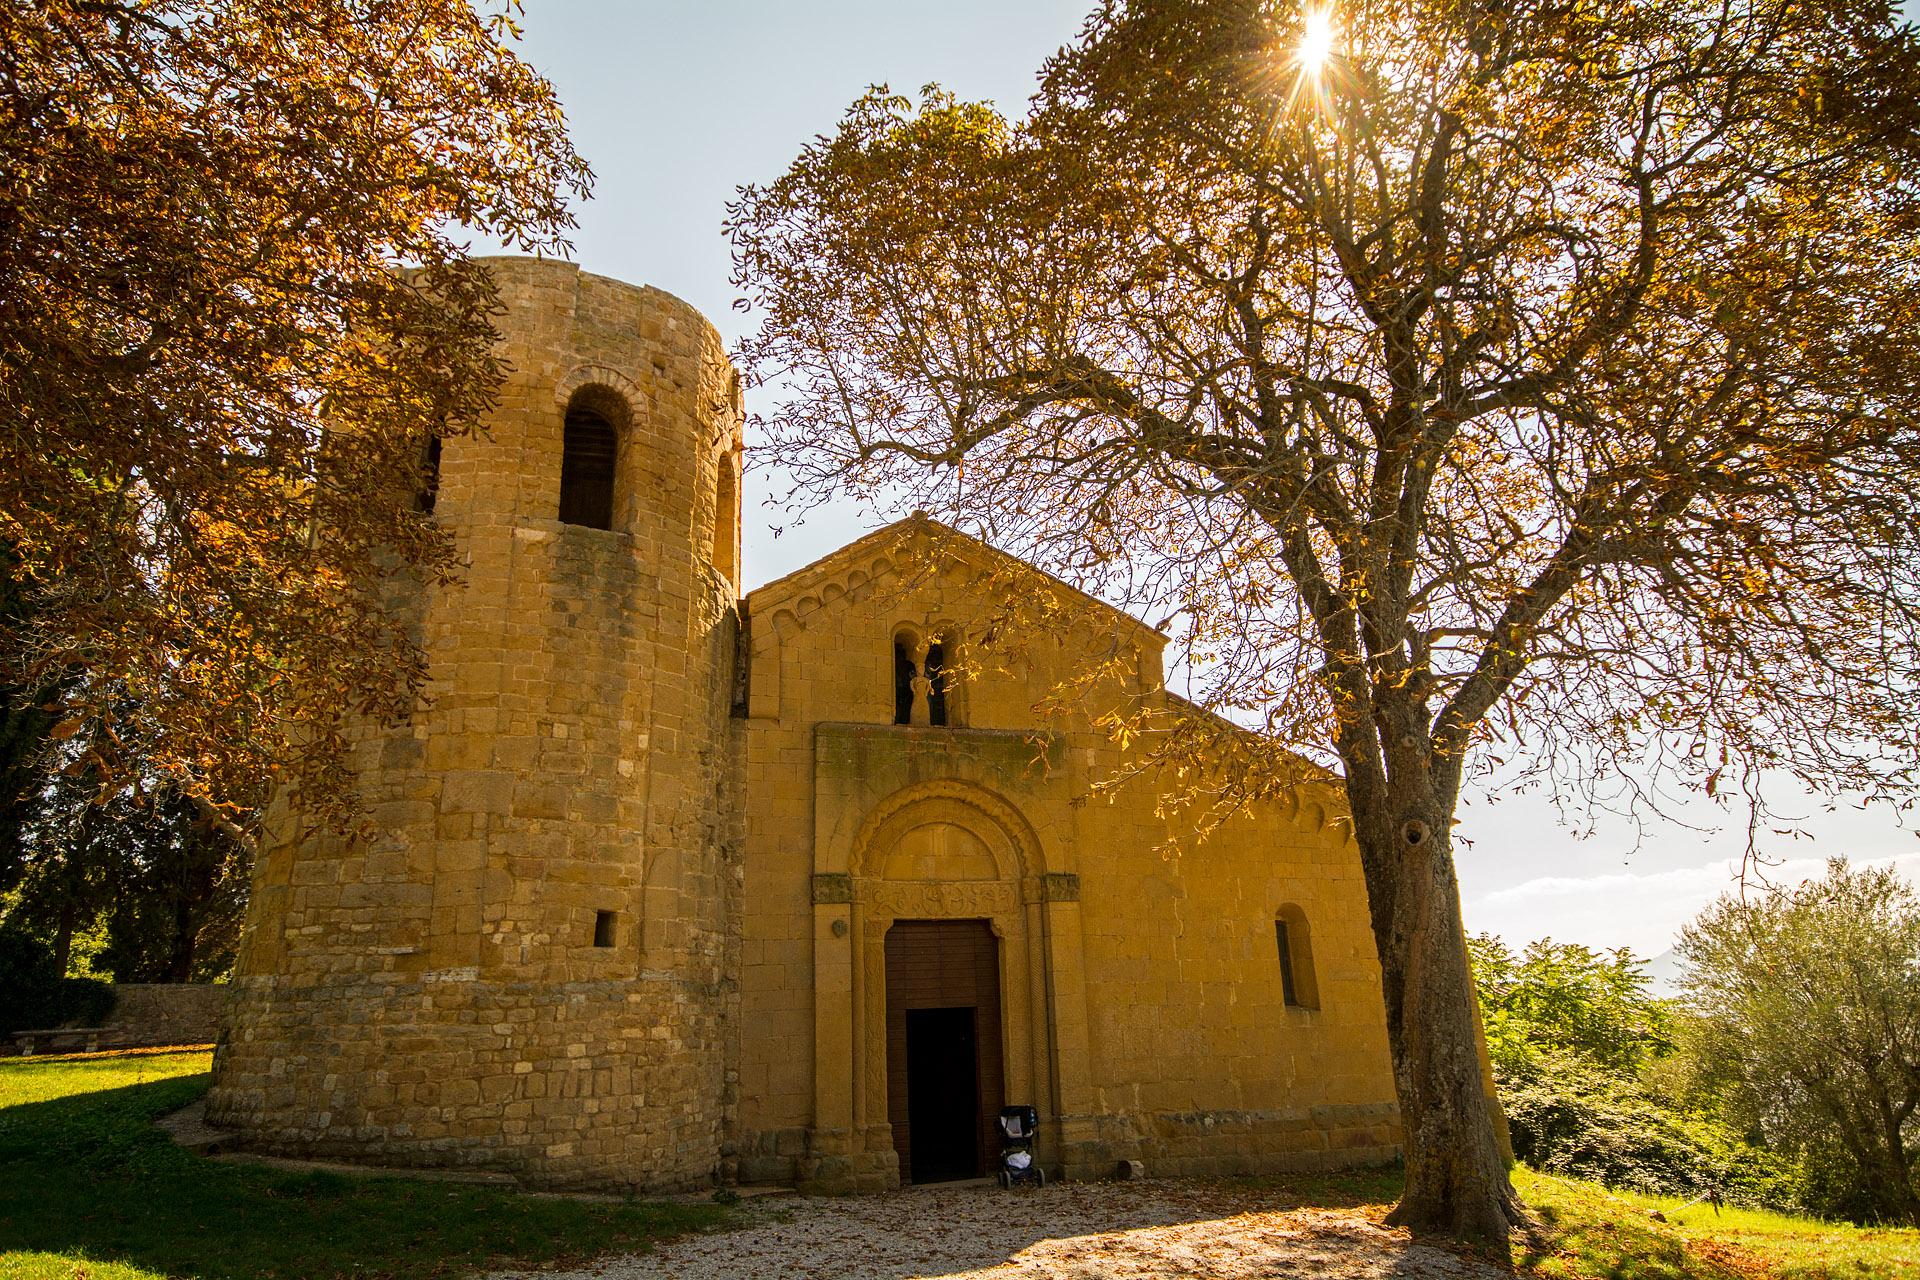 Parish Church of Saints Vito and Modesto